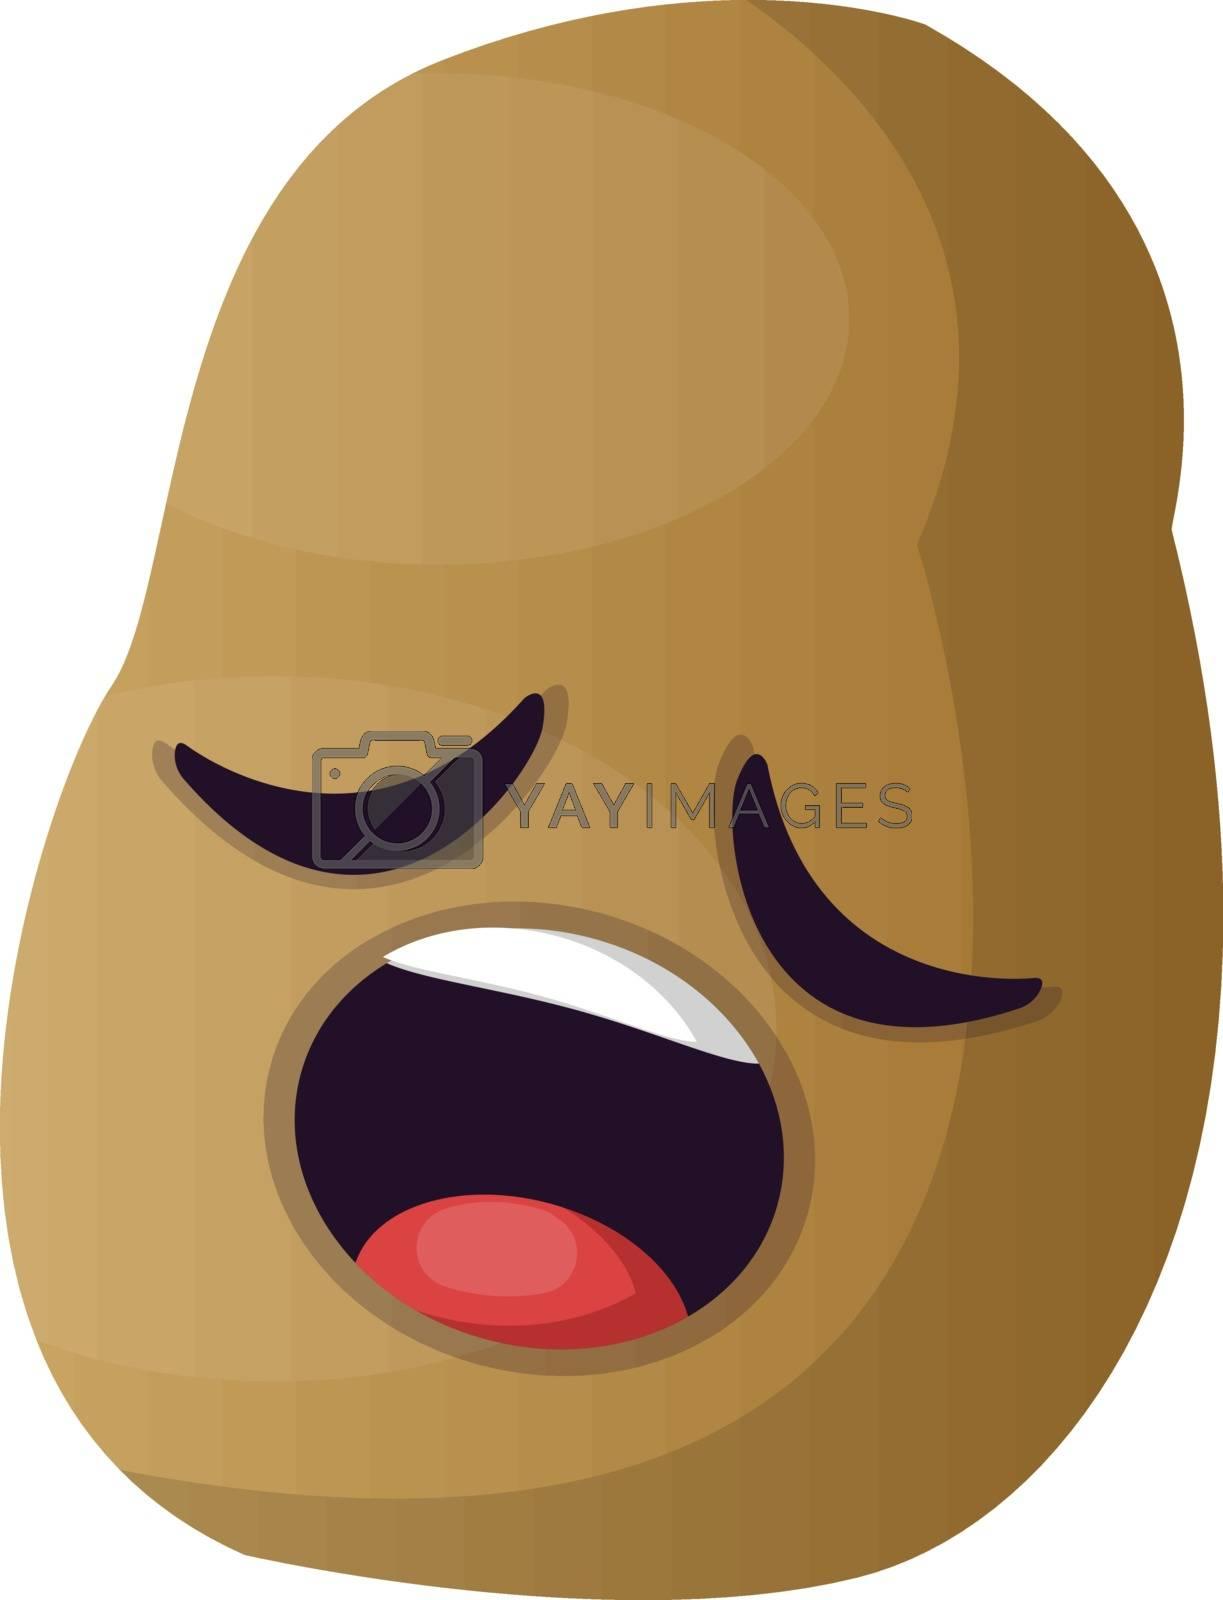 Royalty free image of Sleepy little potato illustration vector on white background by Morphart